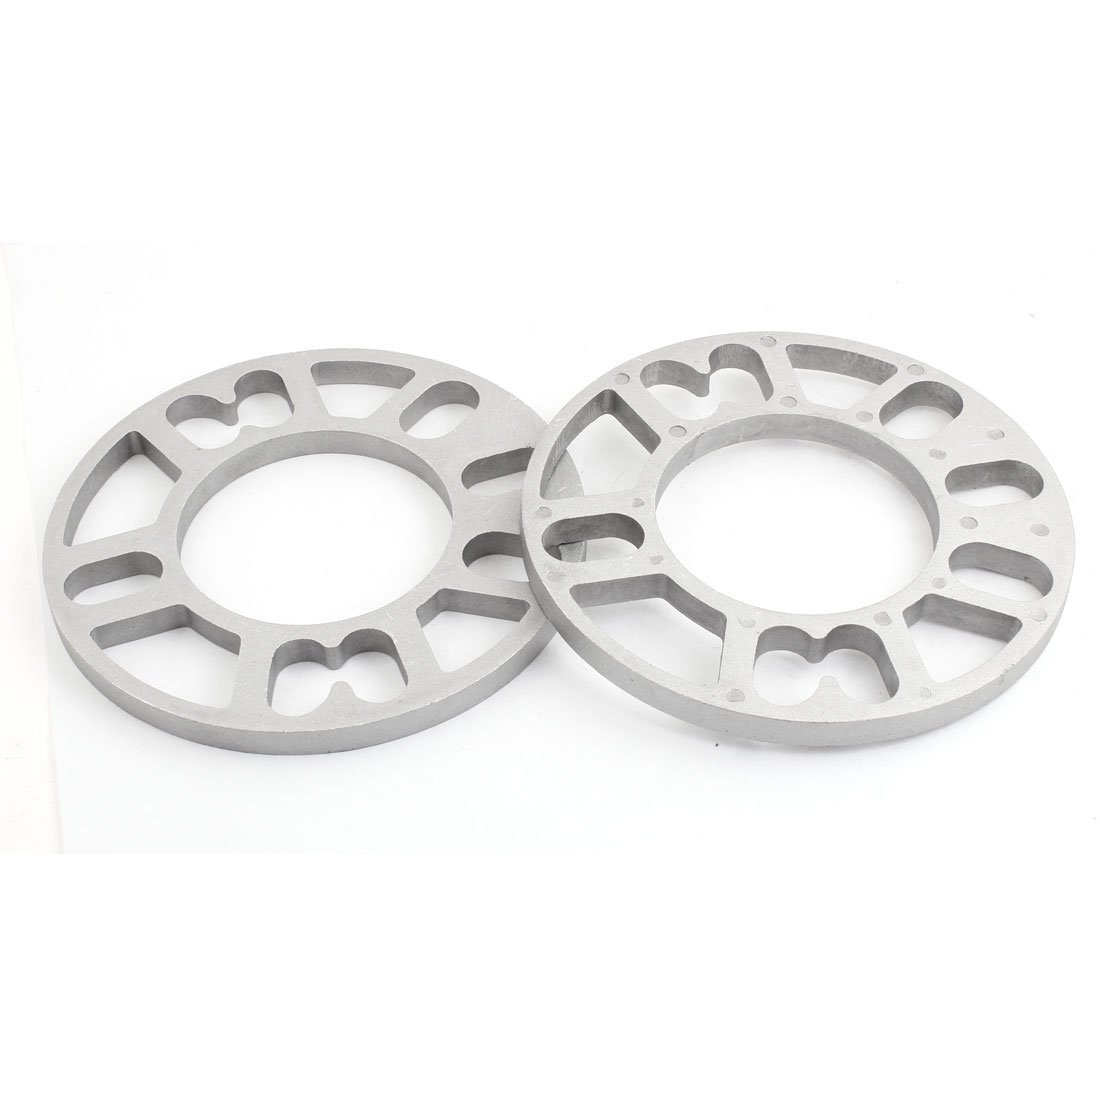 2 Pcs Aluminum Alloy 15cm Dia Wheel Spacer Gasket for Auto Vehicle